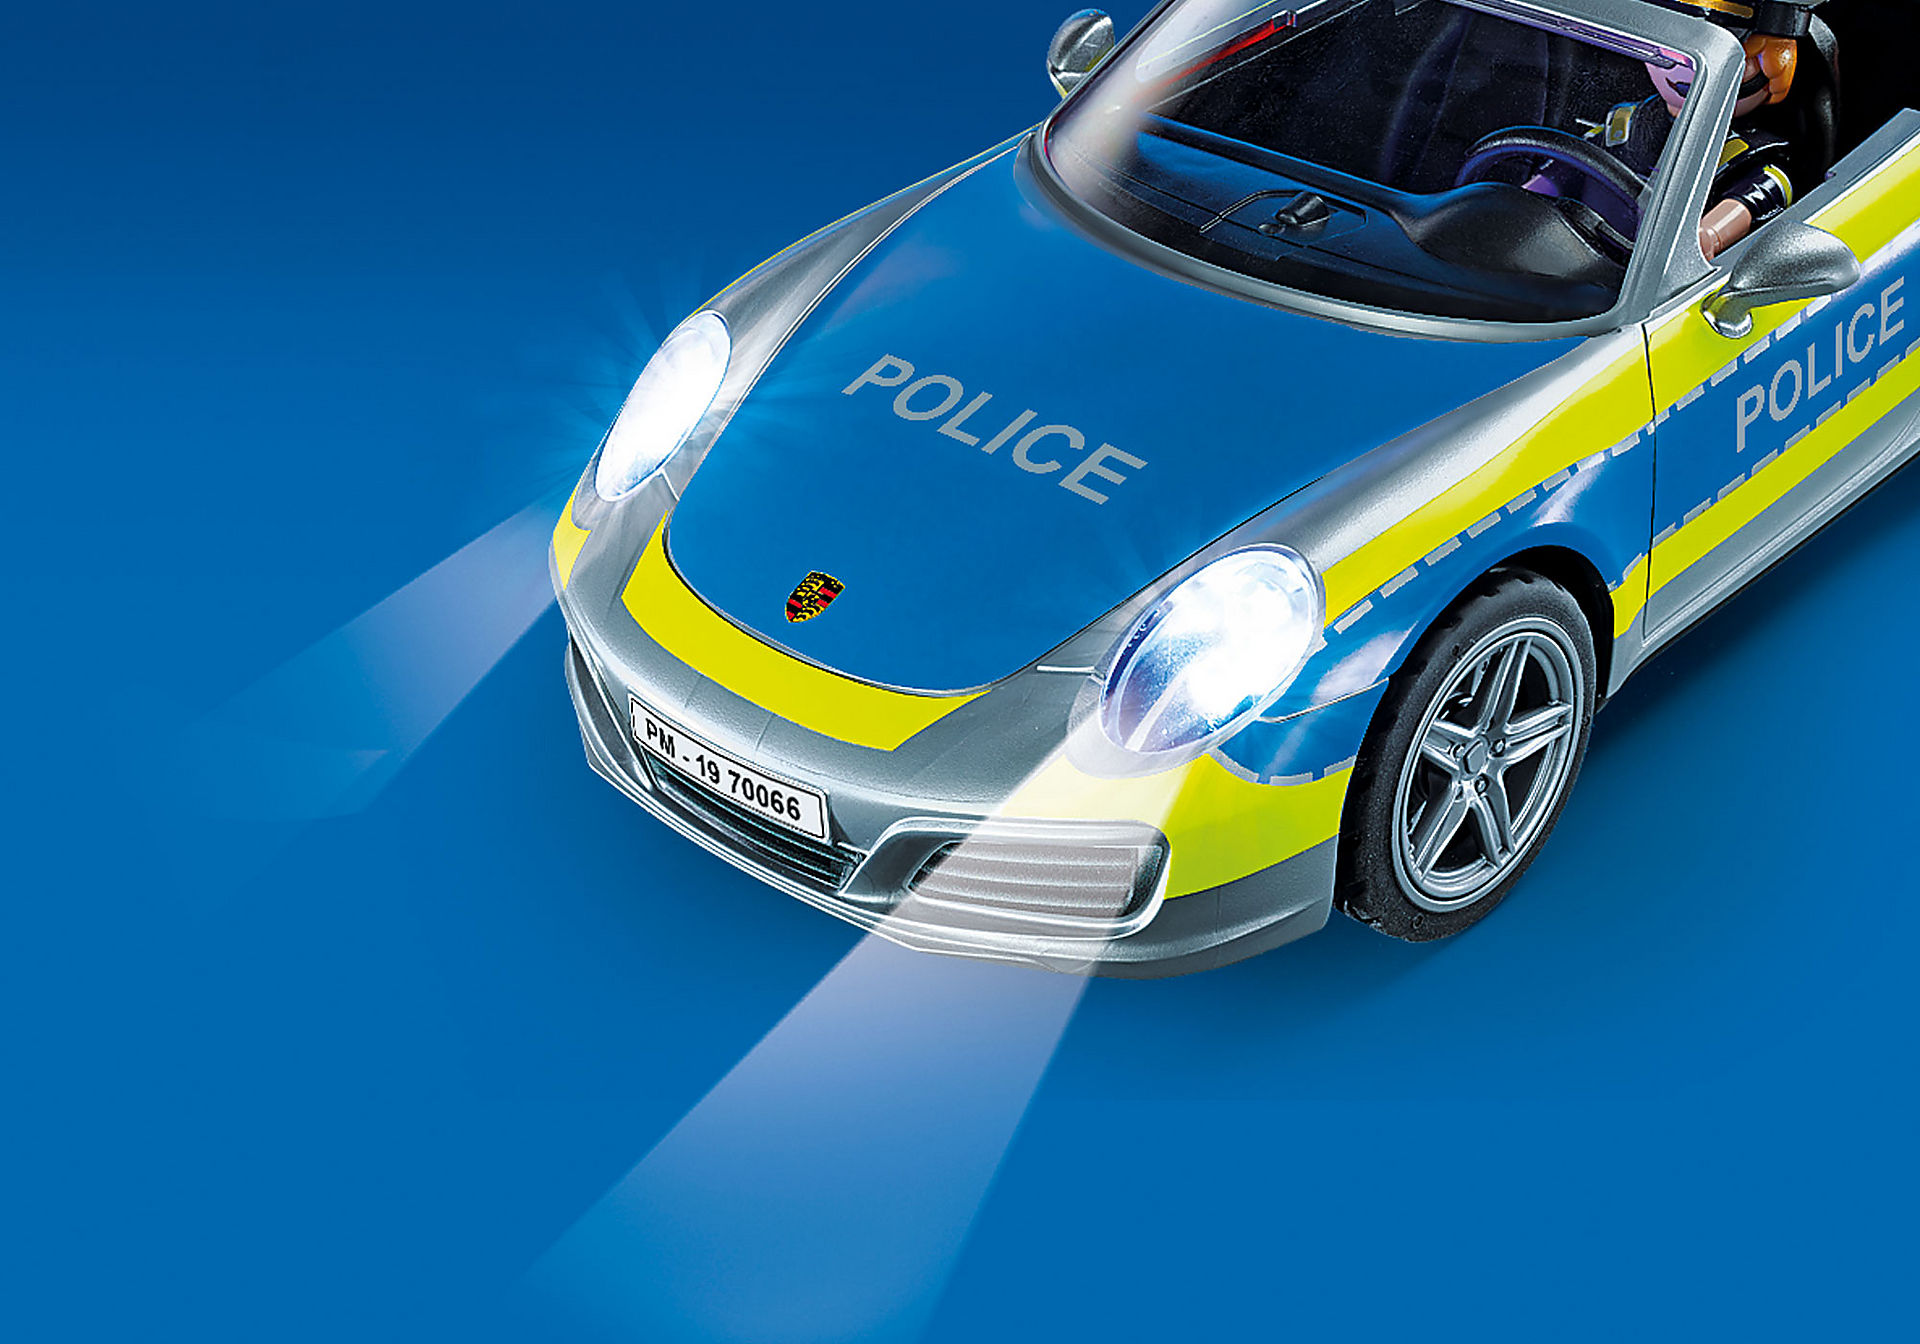 70066 Porsche 911 Carrera 4S Policja zoom image6